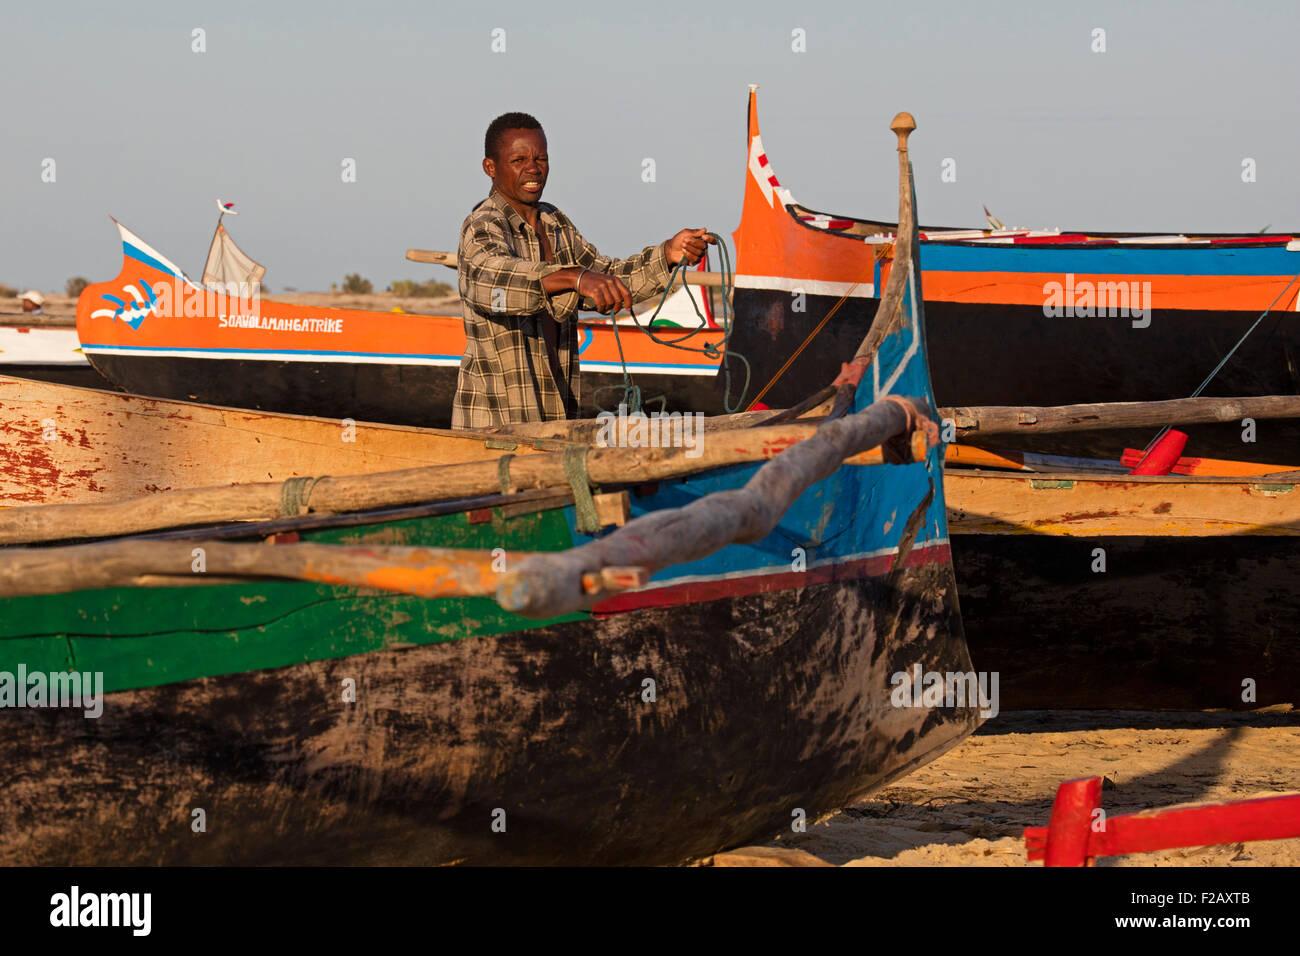 Malagasy fisherman working among pirogues / piraguas / piragas on beach in Morondava, Menabe, Madagascar, Southeast - Stock Image